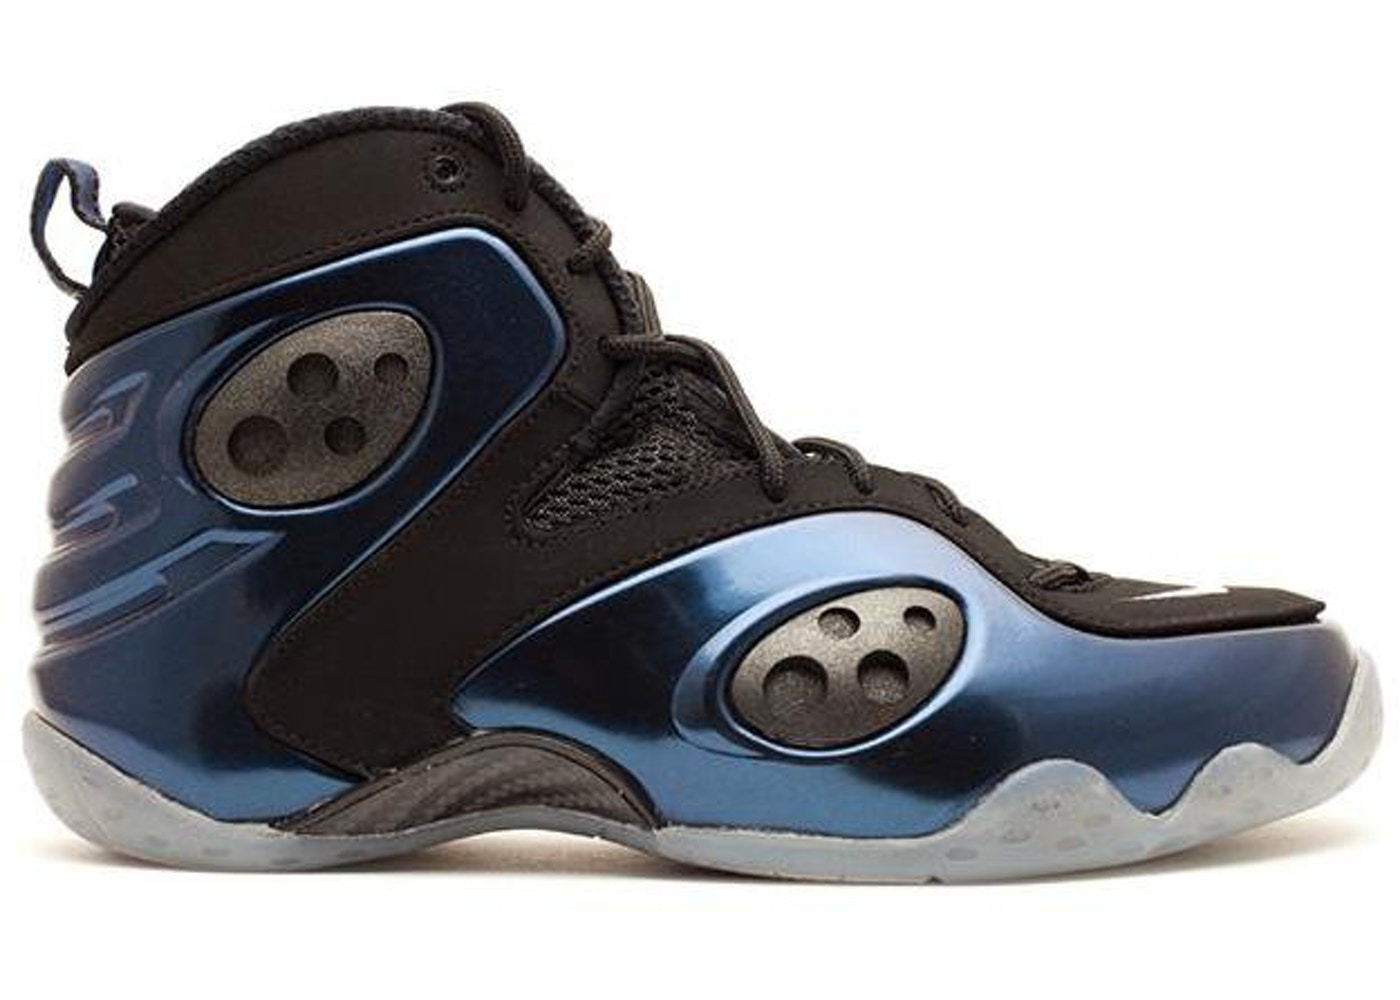 3d22c5bf6f1 Nike Zoom Rookie Binary Blue - 472688-400